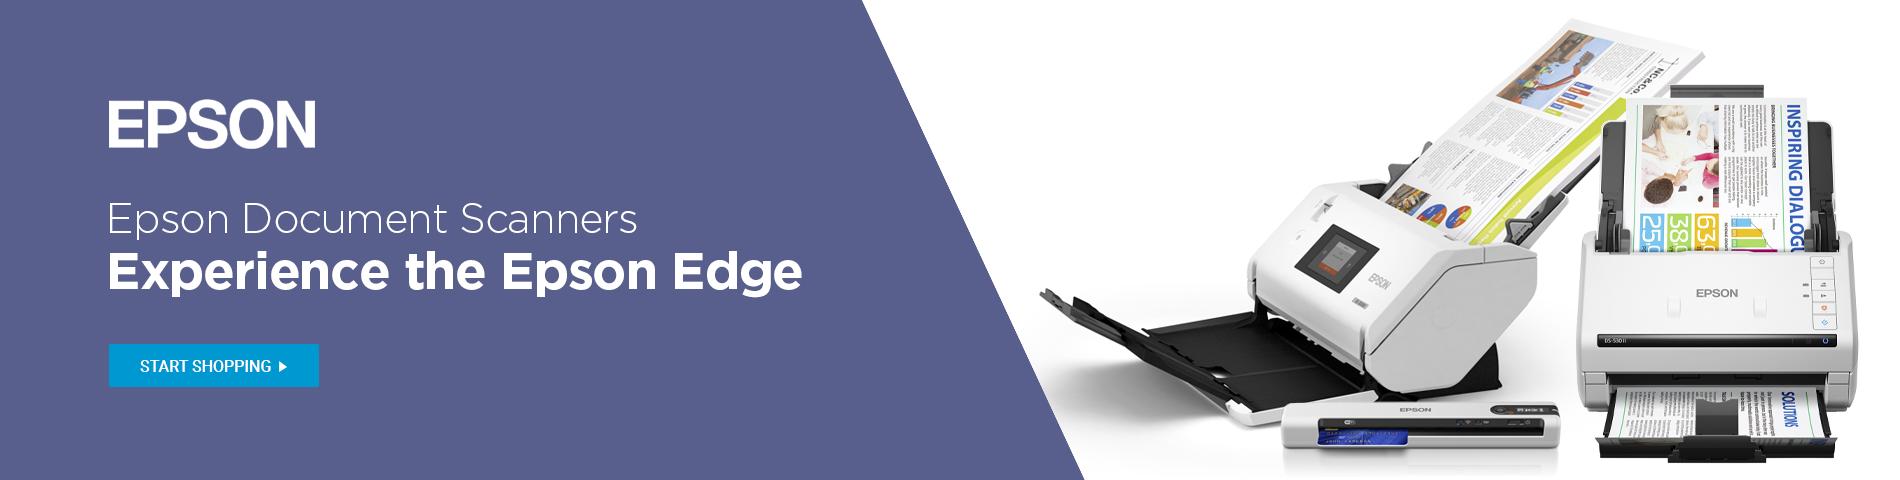 Epson Document Scanners - Experience the Epson Edge